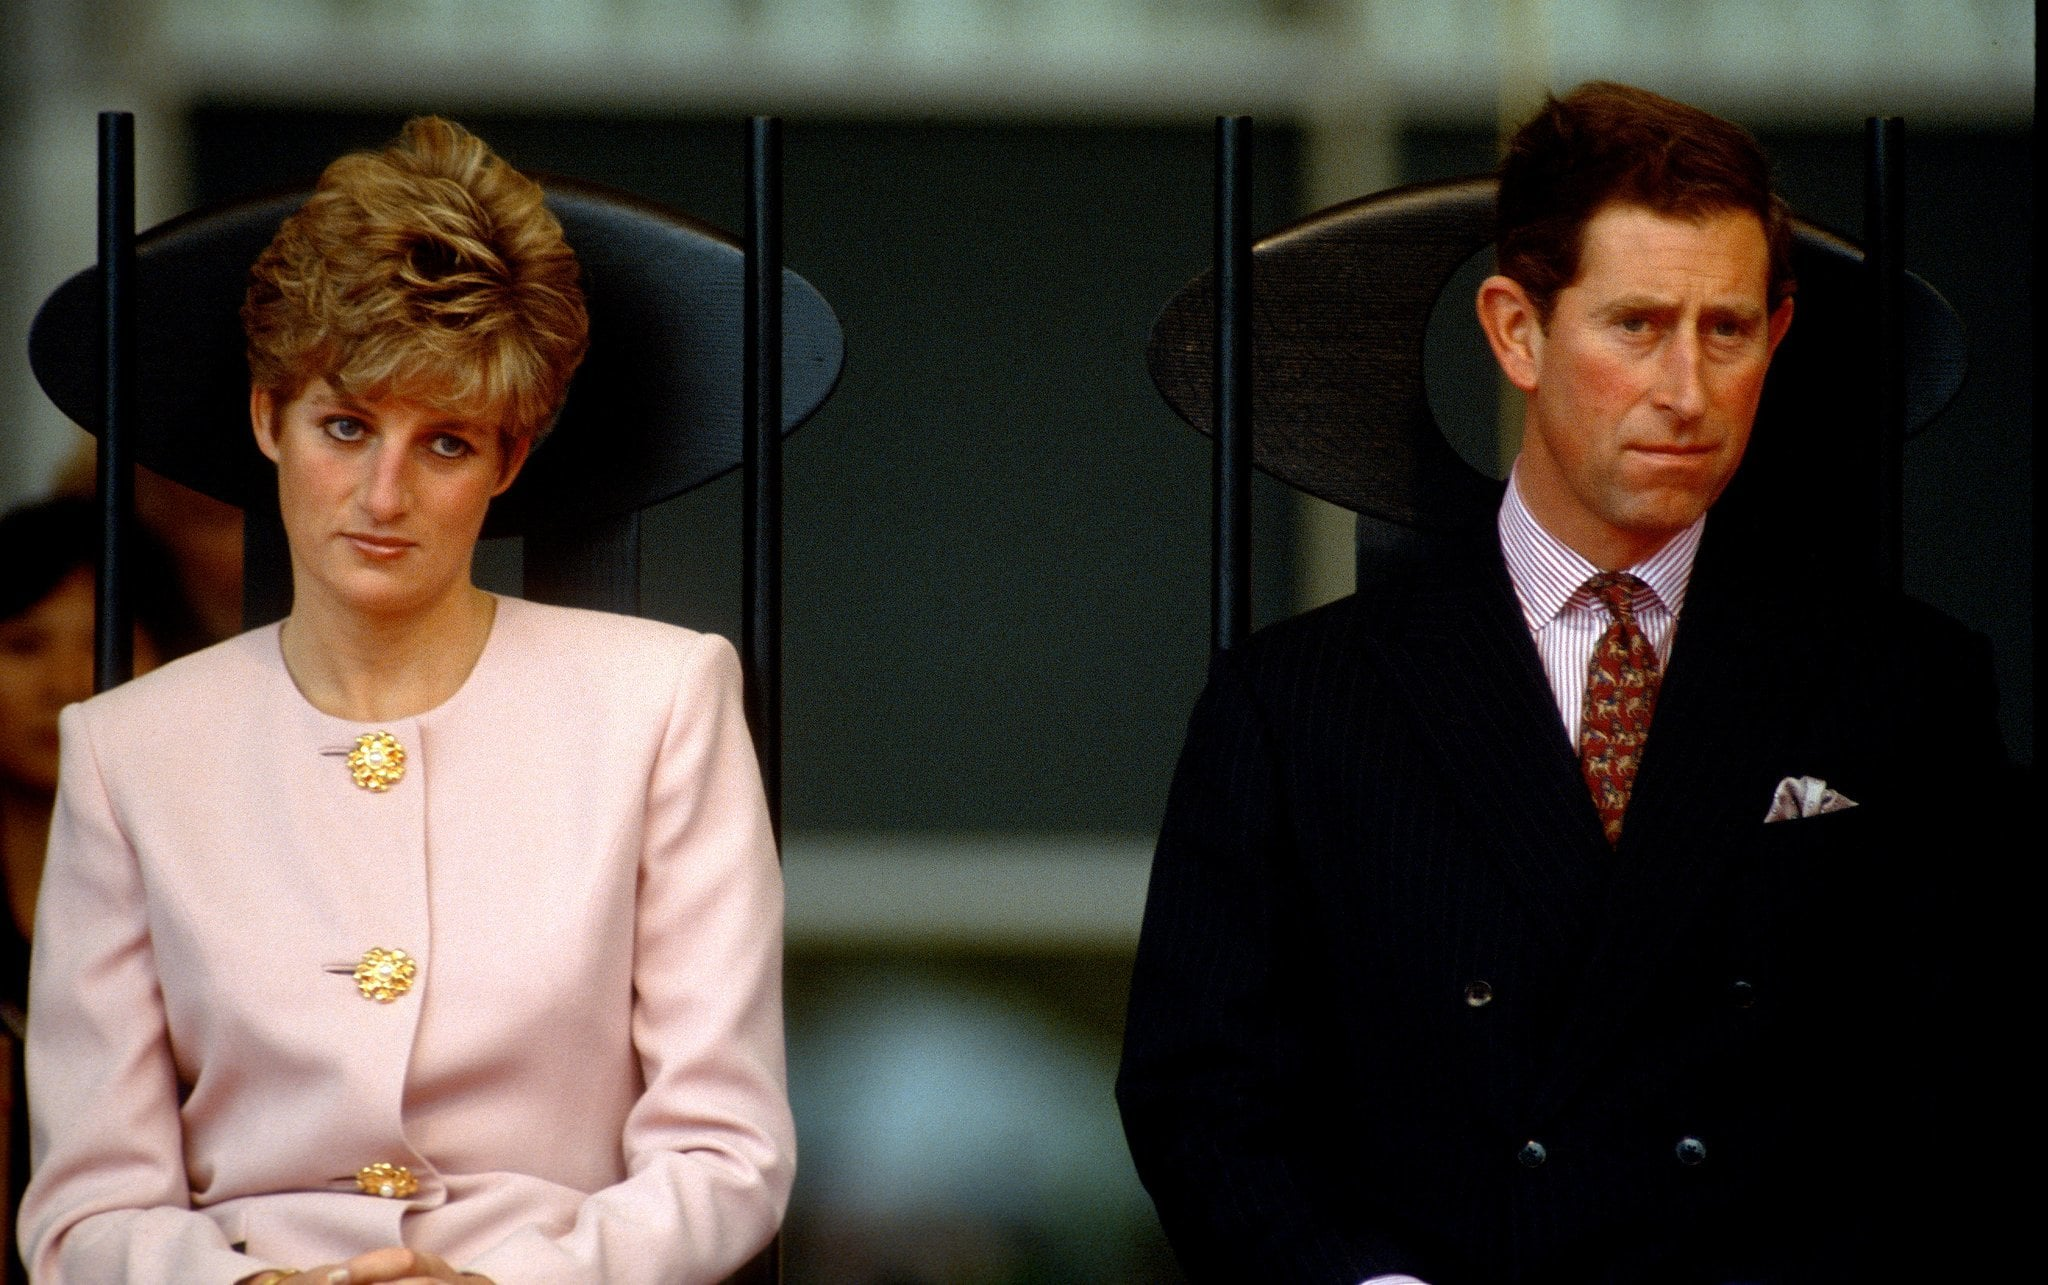 Princess Diana – A hapless victim or savvy manipulator?